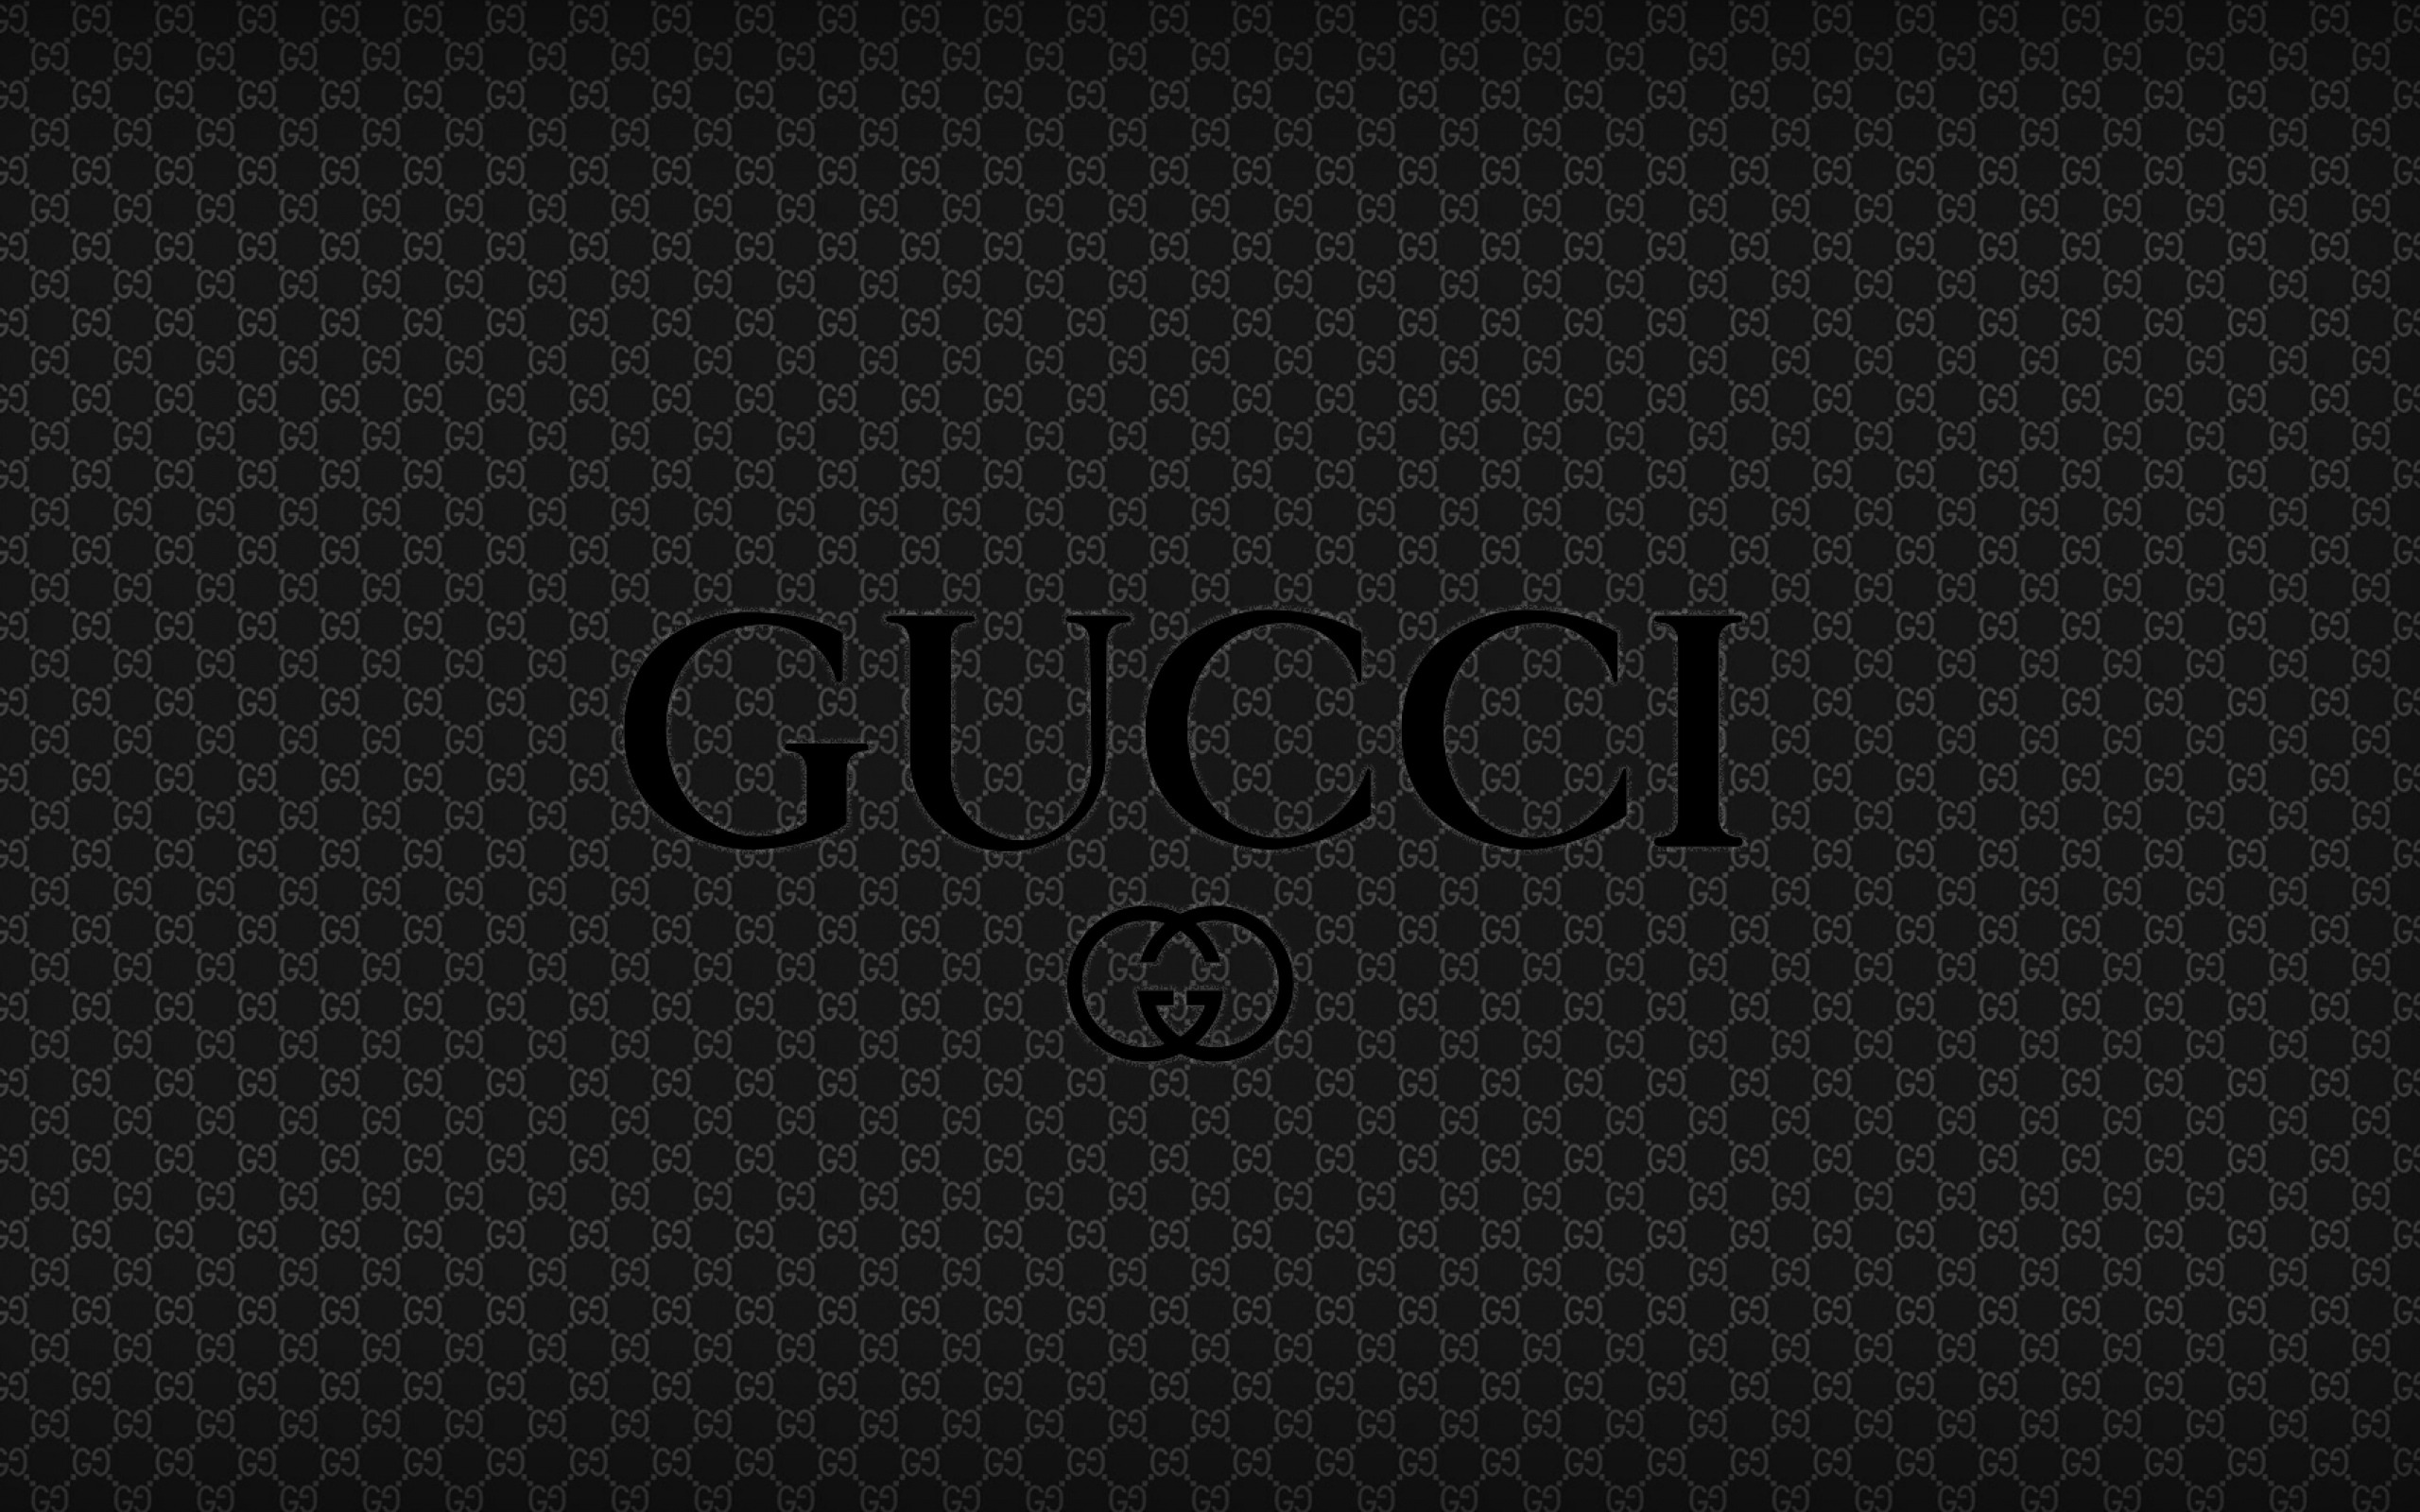 Gucci Logo Brand Hd Wallpaper Avance 10wallpapercom